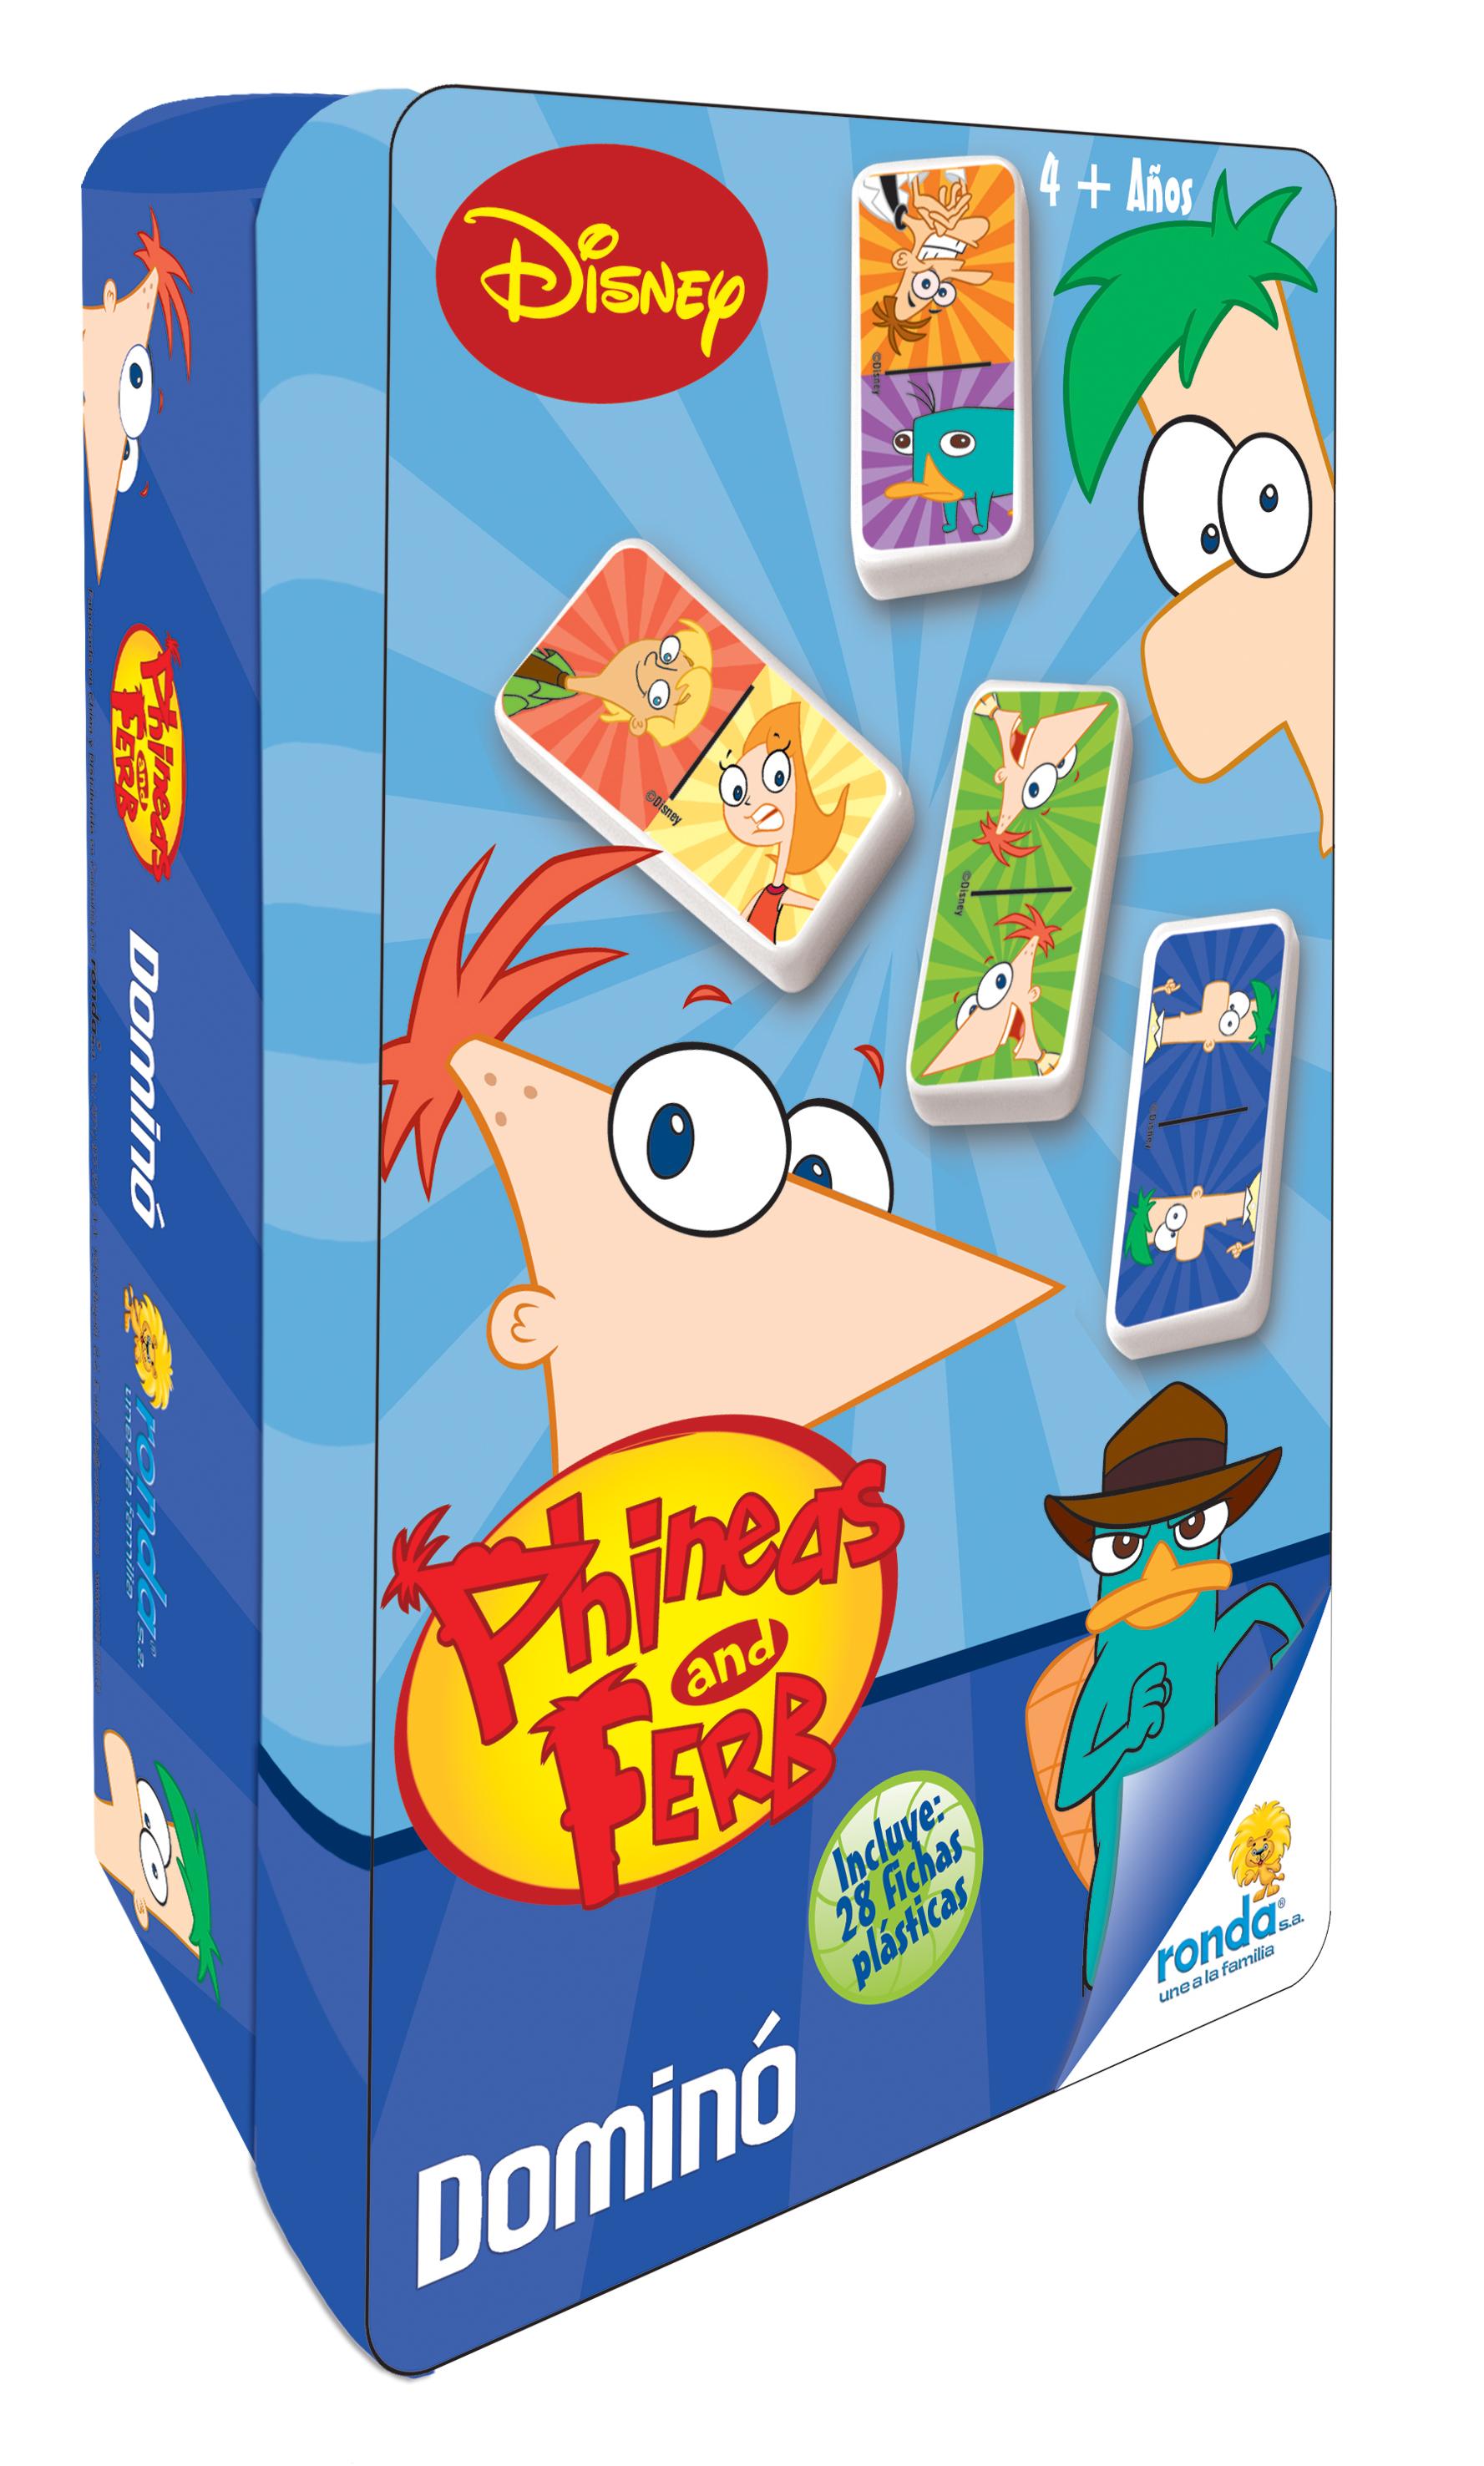 Phineas & Pherb Domino